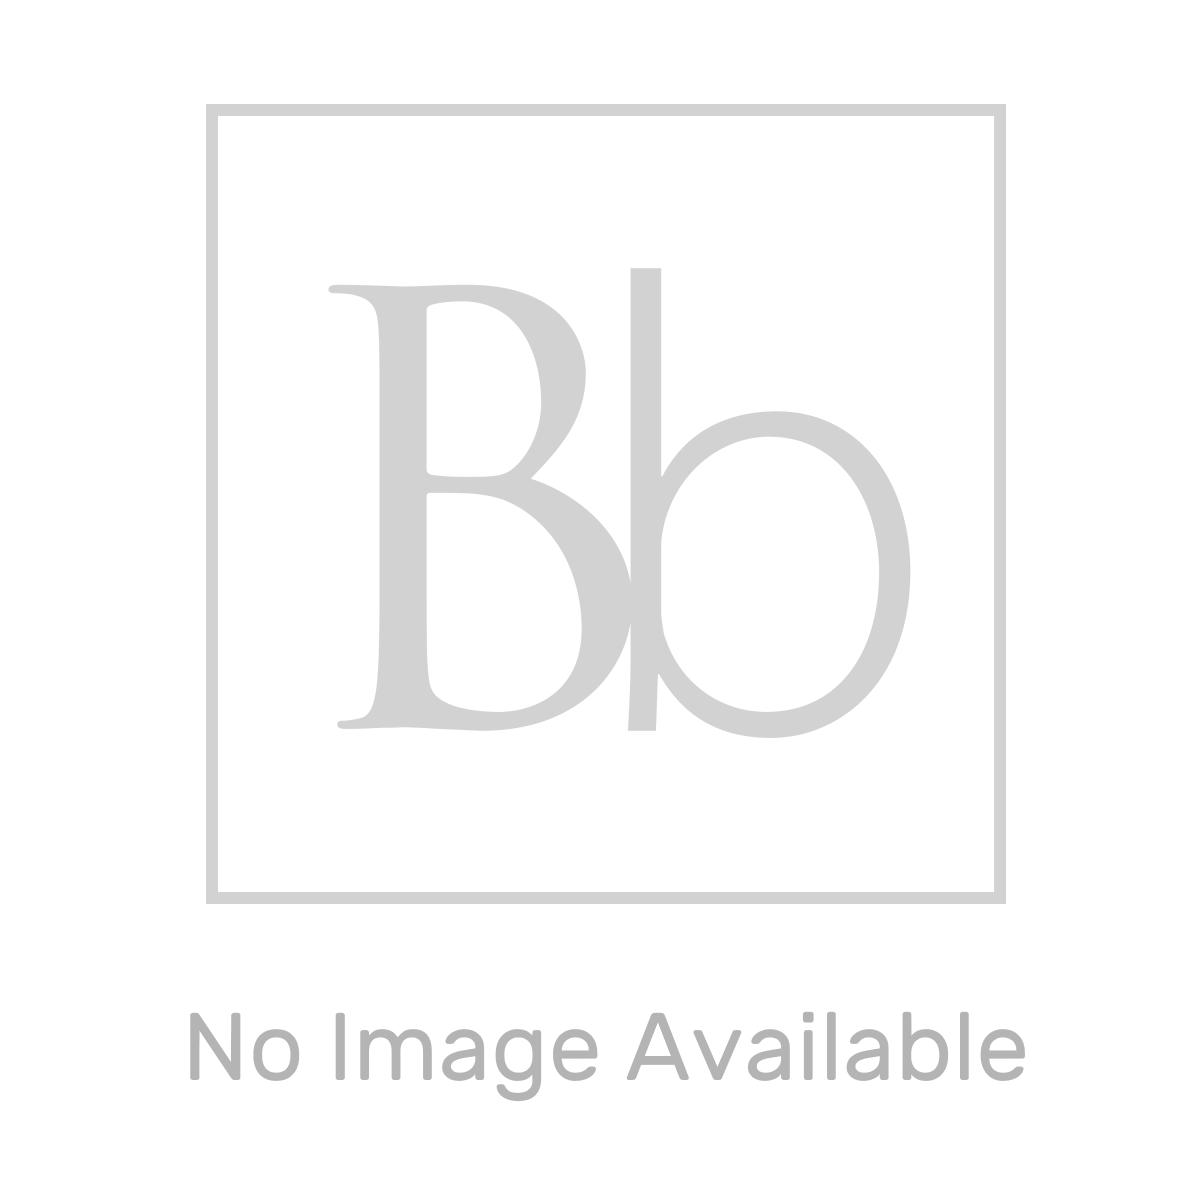 RAK Moon Round Counter Top Basin 420mm Measurements